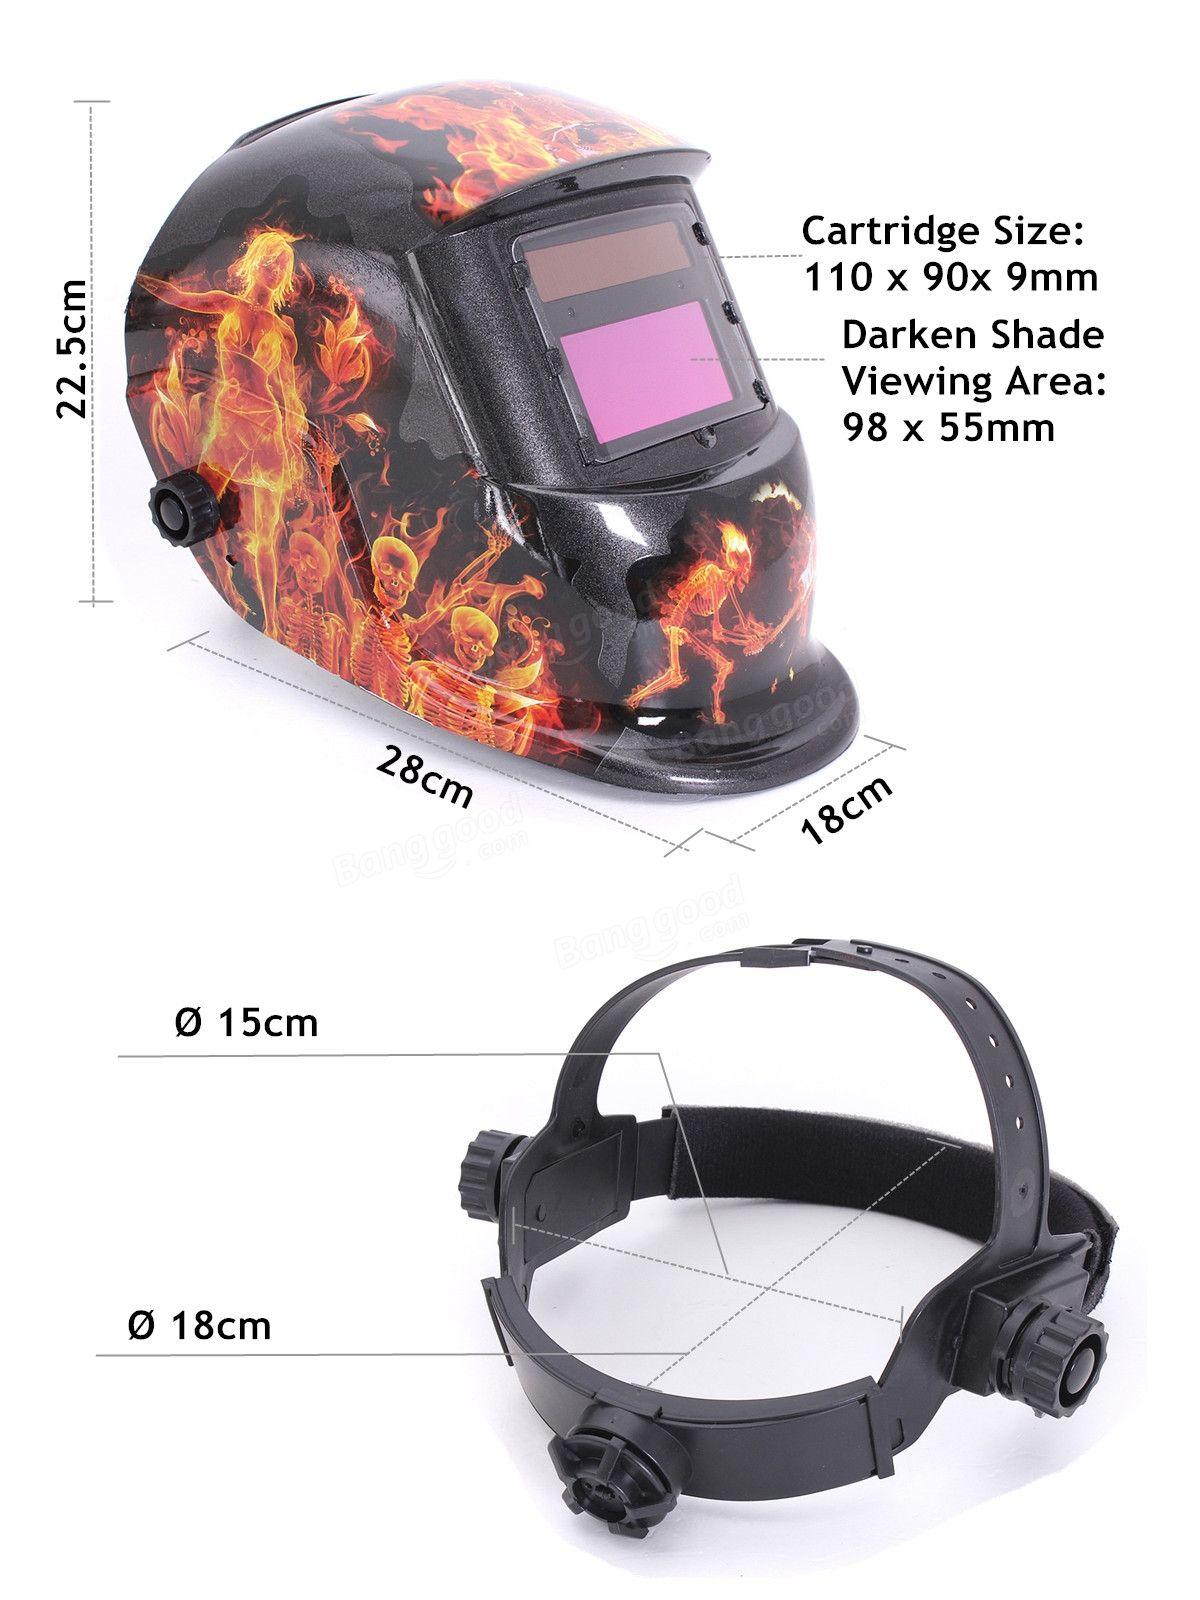 Ghost Fire Solar Auto Darkening Welding Helmet Arc Tig mig Grinding Welders Mask Sale - Banggood.com